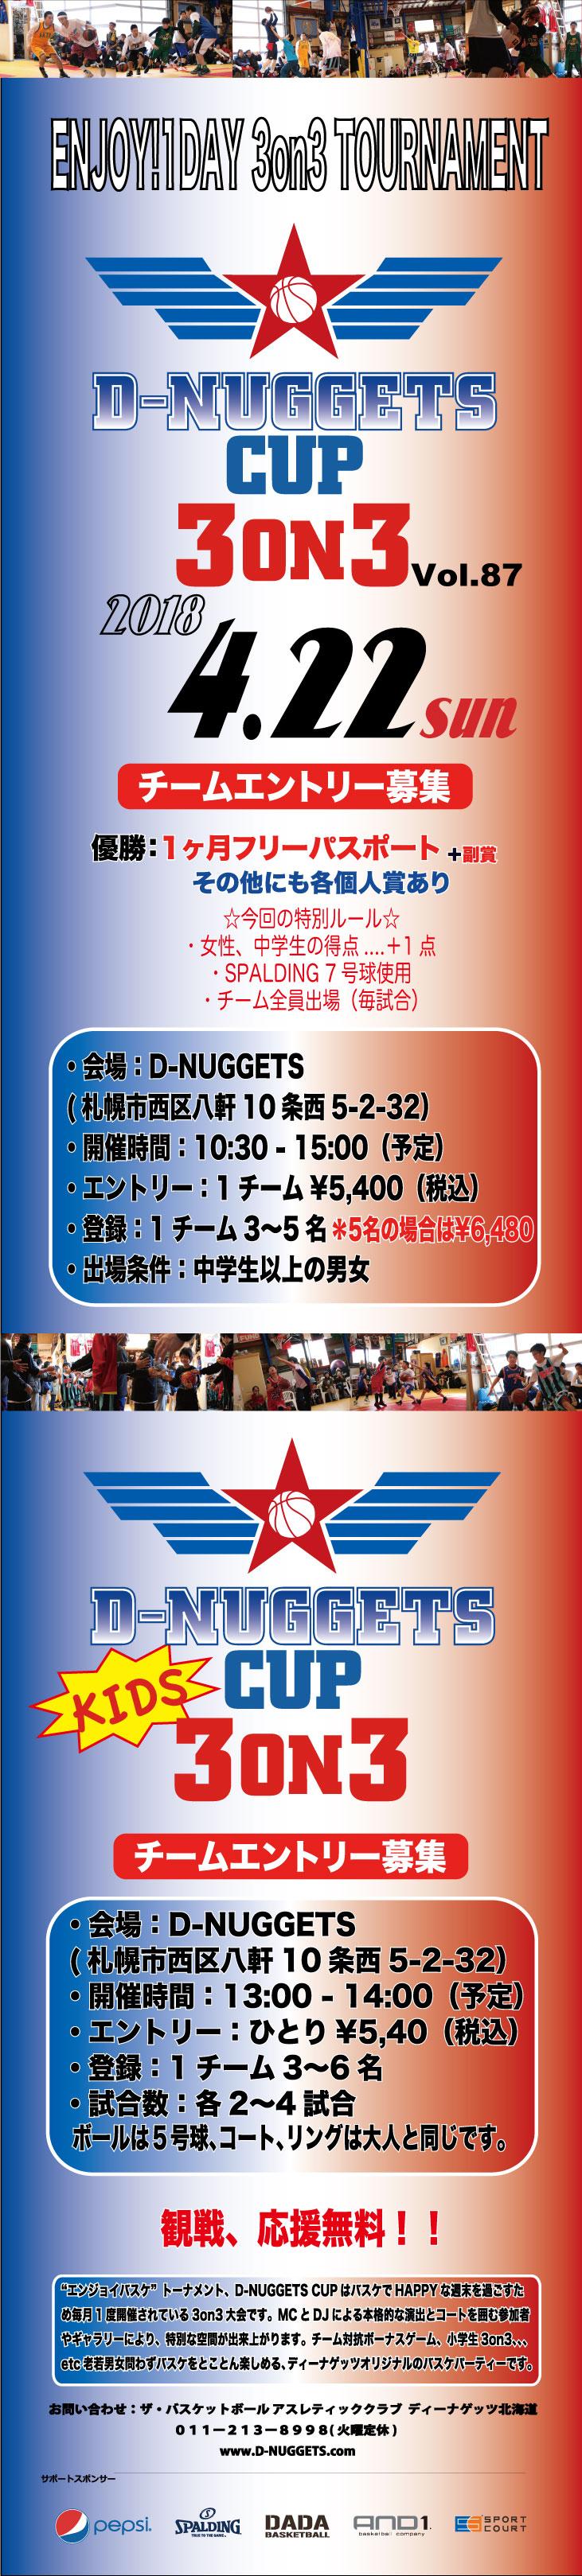 D-NUGGETS-CUP-HOKKAIDO%20Vol.87.jpg